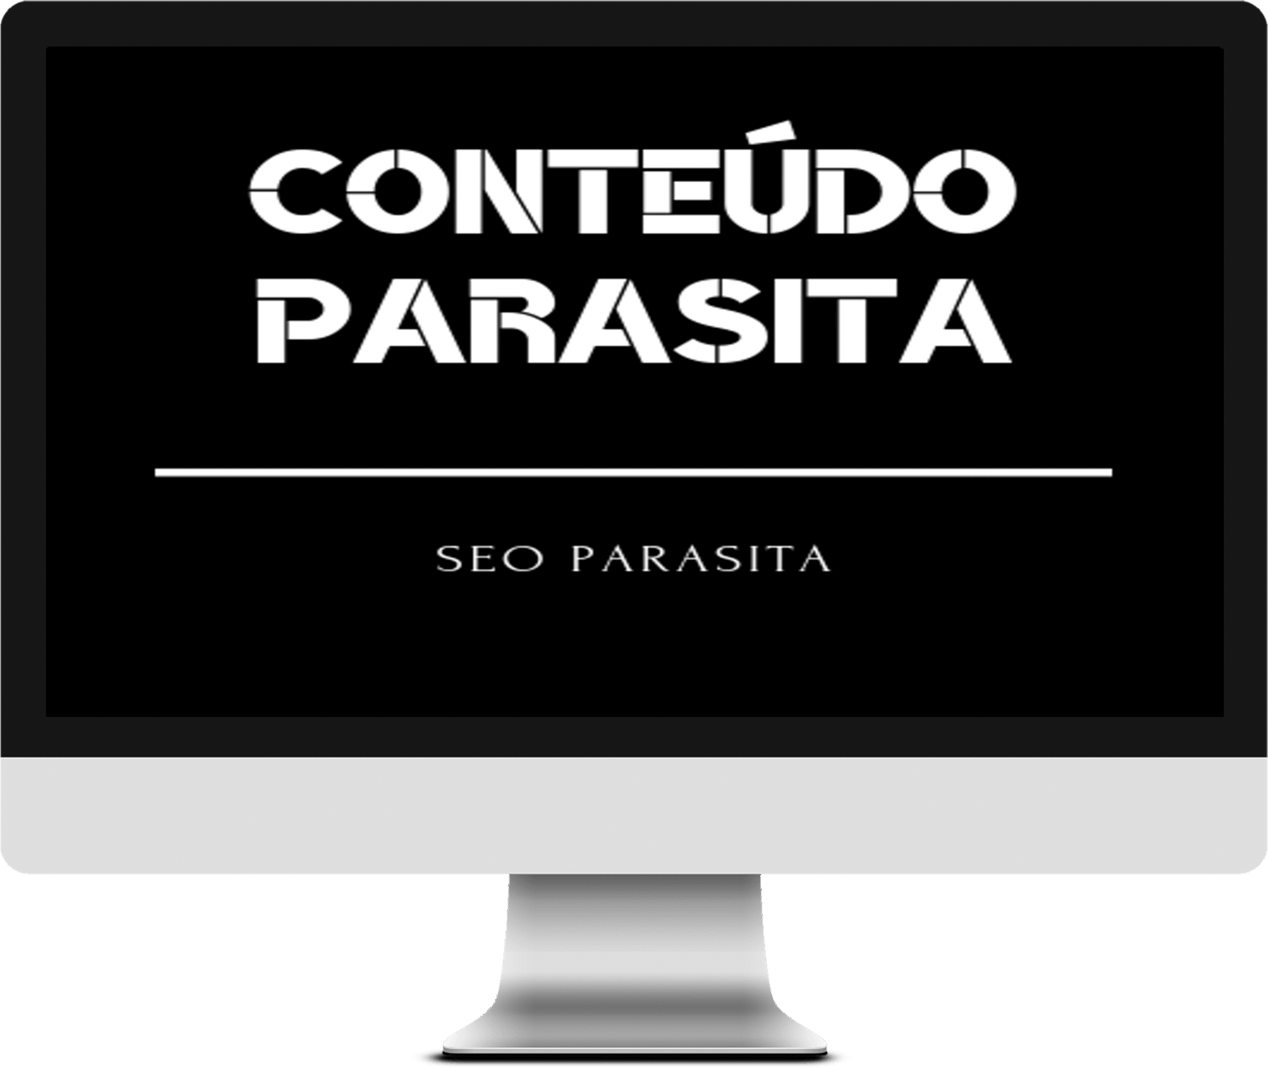 seo parasita